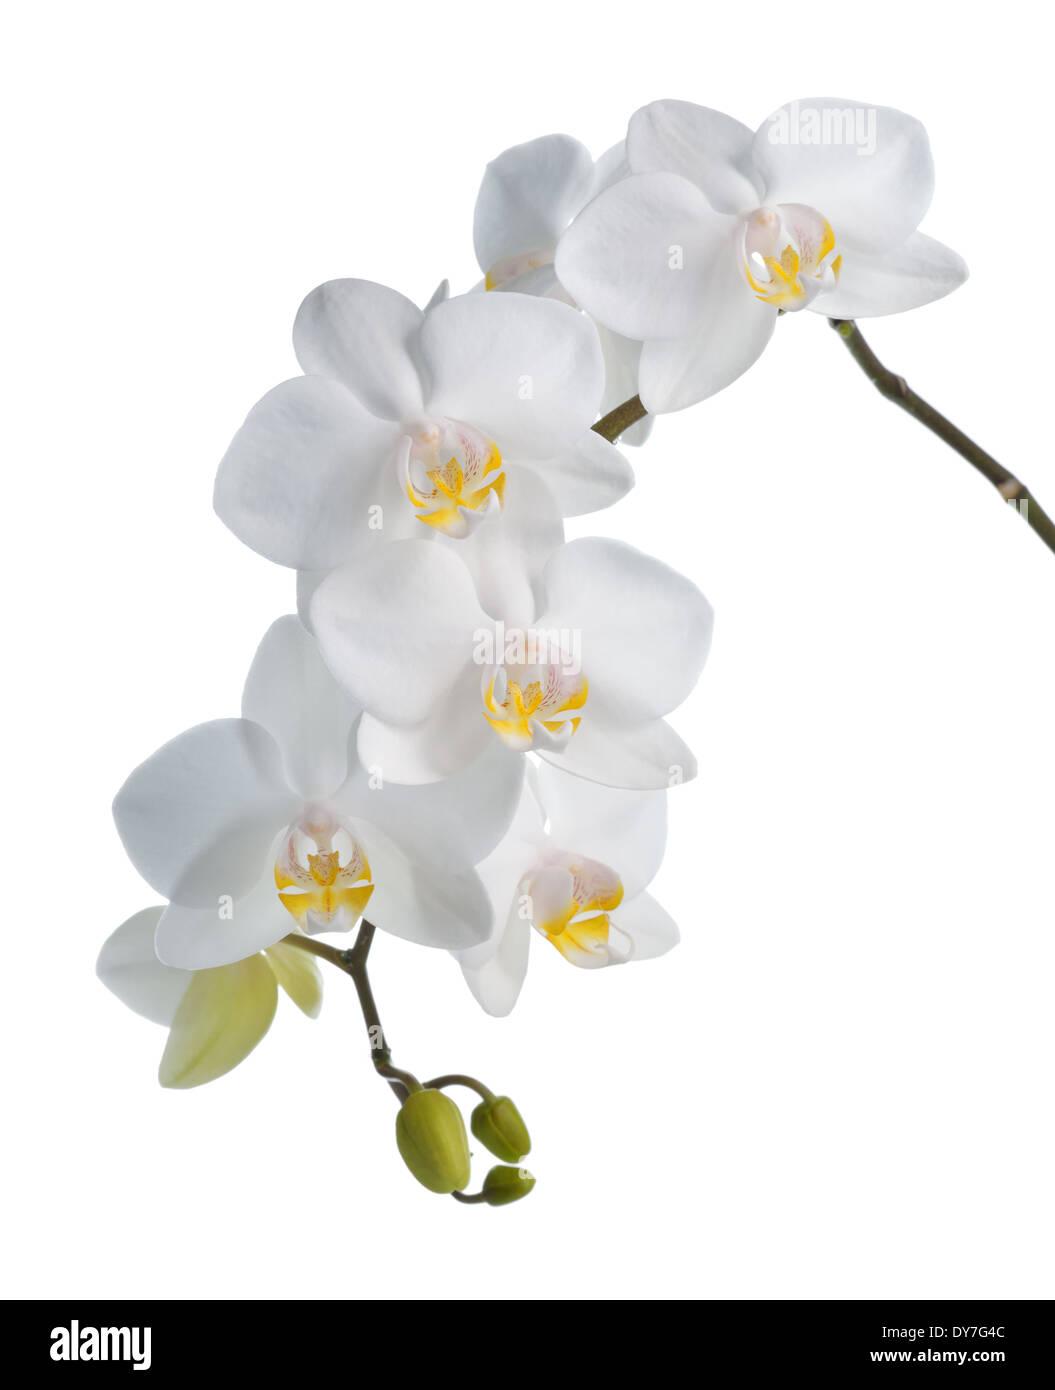 White orchid phalaenopsis isolated on white background. Tropical white flowers. - Stock Image